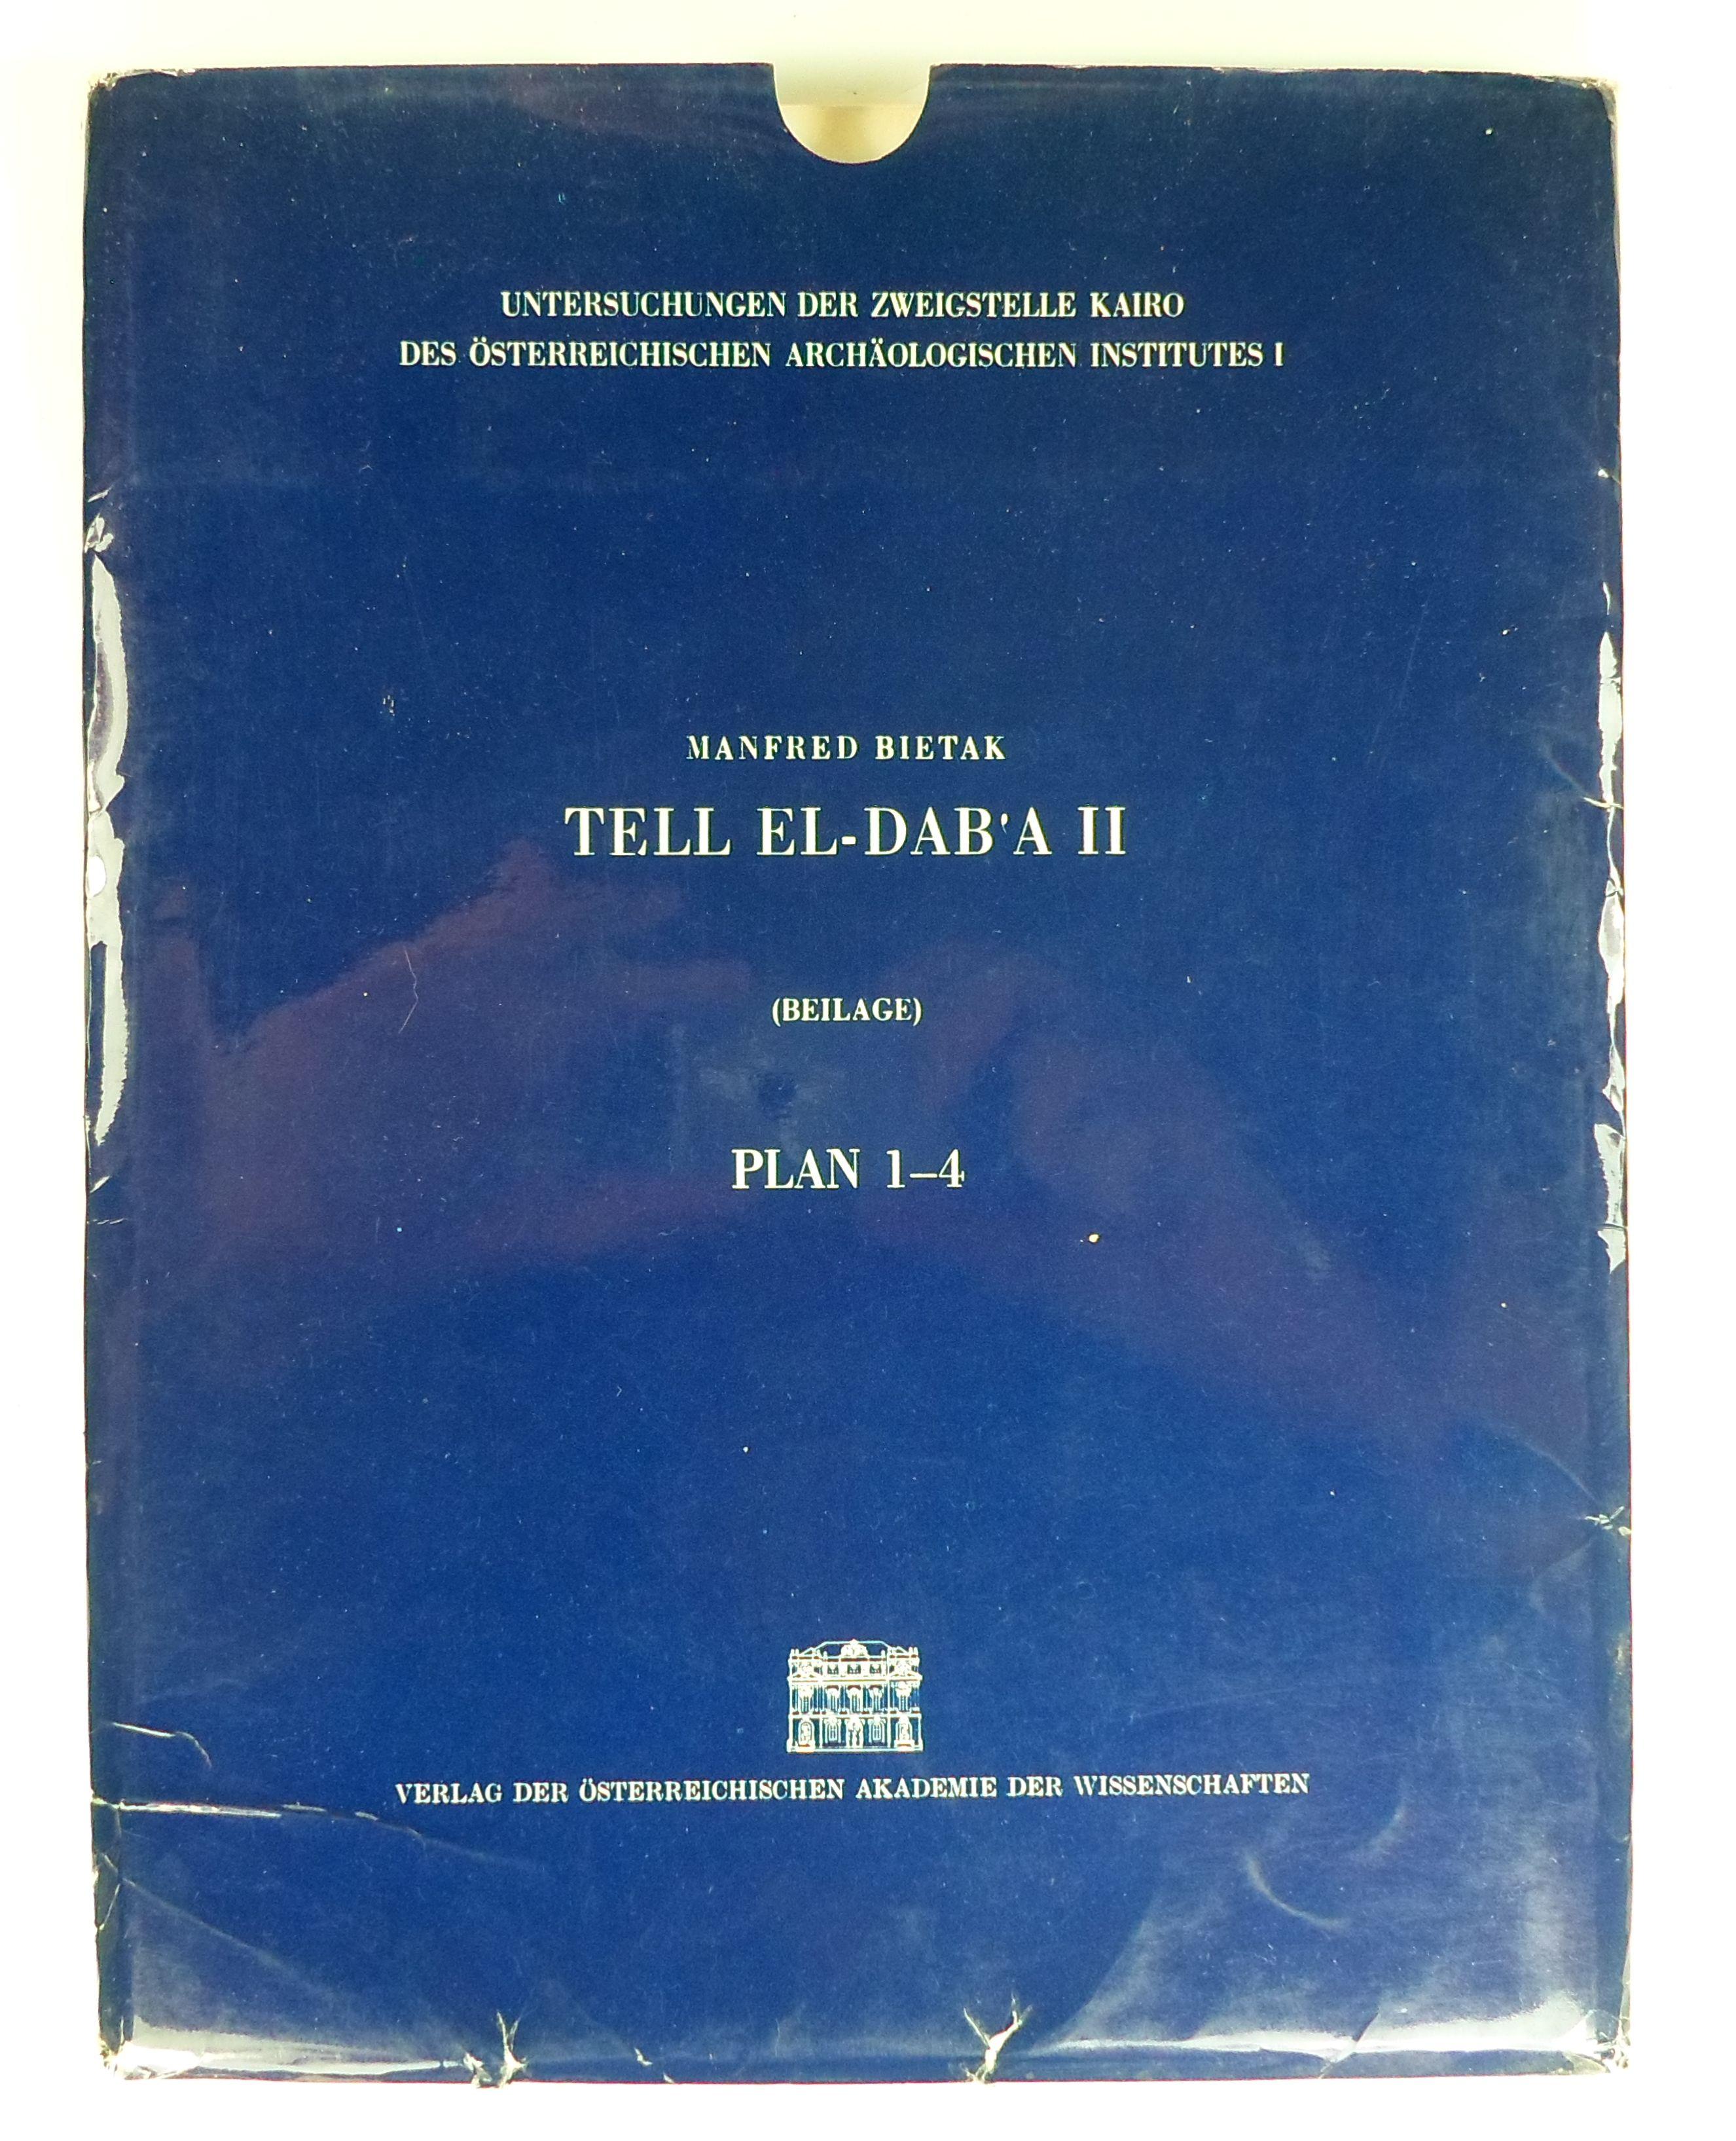 Tell El-Dab'a II. (Beilage). Plan 1-4. (Untersuchungen: Bietak, Manfred: